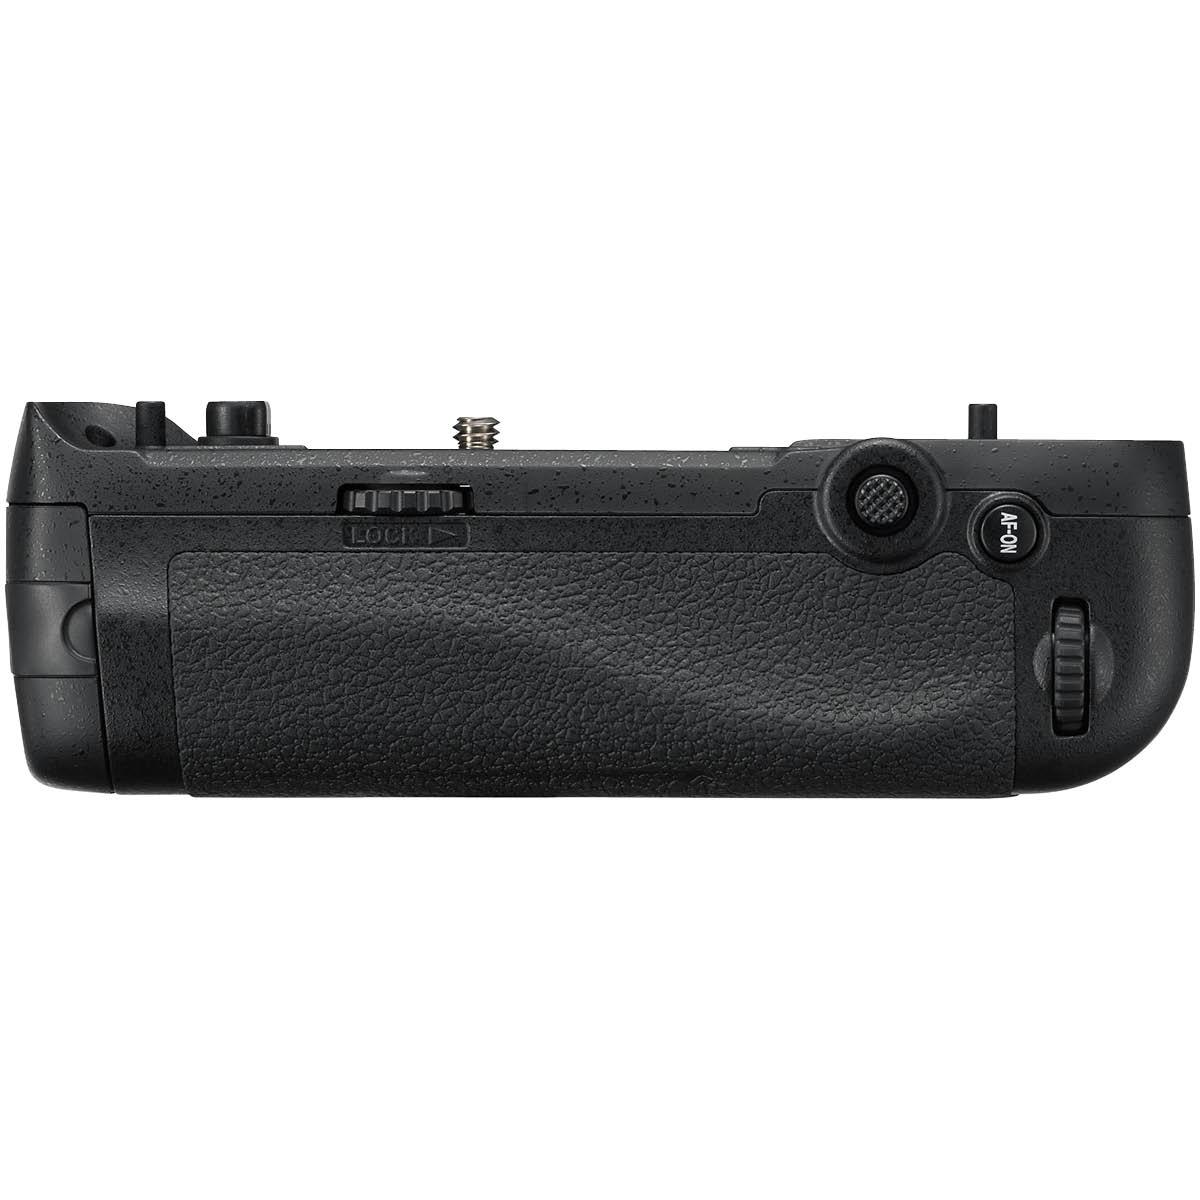 Nikon MB-D17 Multifunktions-Batteriehandgriff